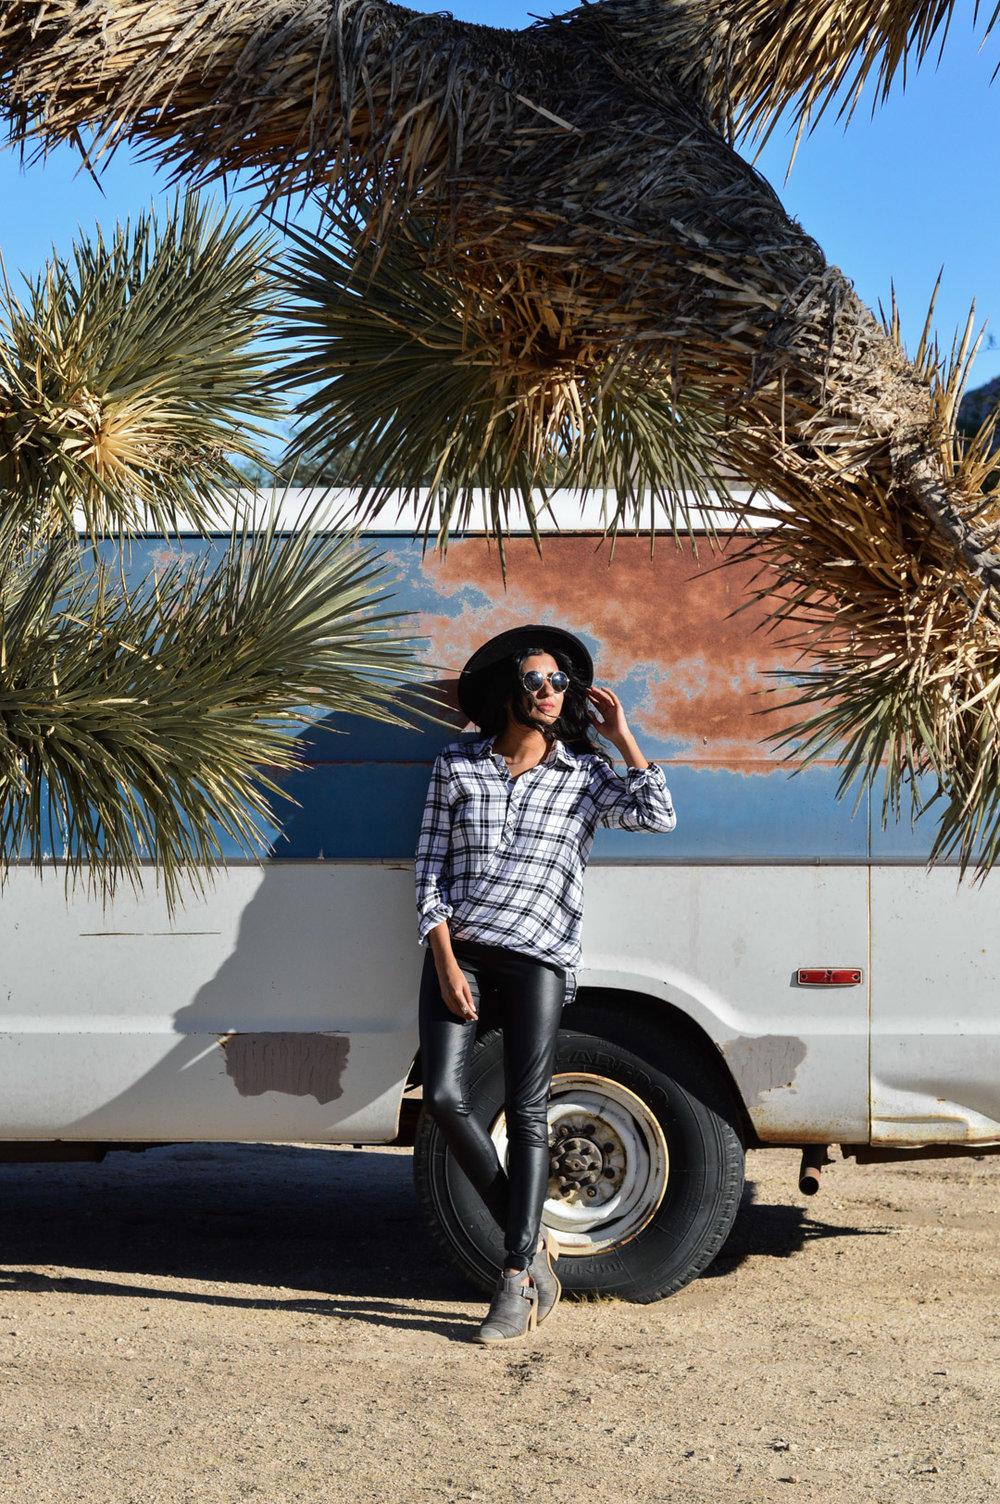 joshua-tree-national-park-california-travel-blogger-fashion 8